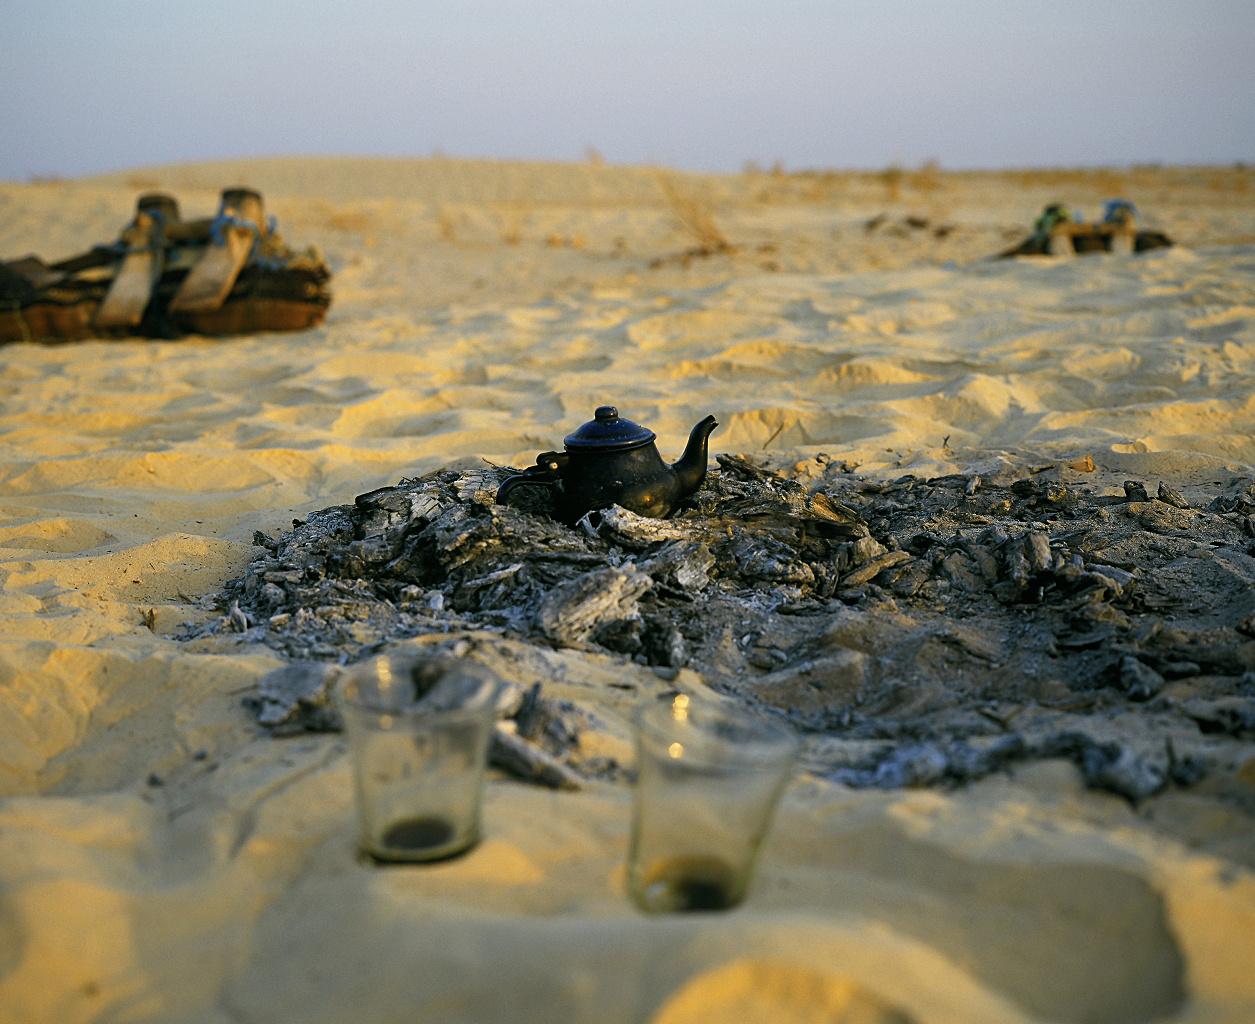 Tunisia Photo Gallery